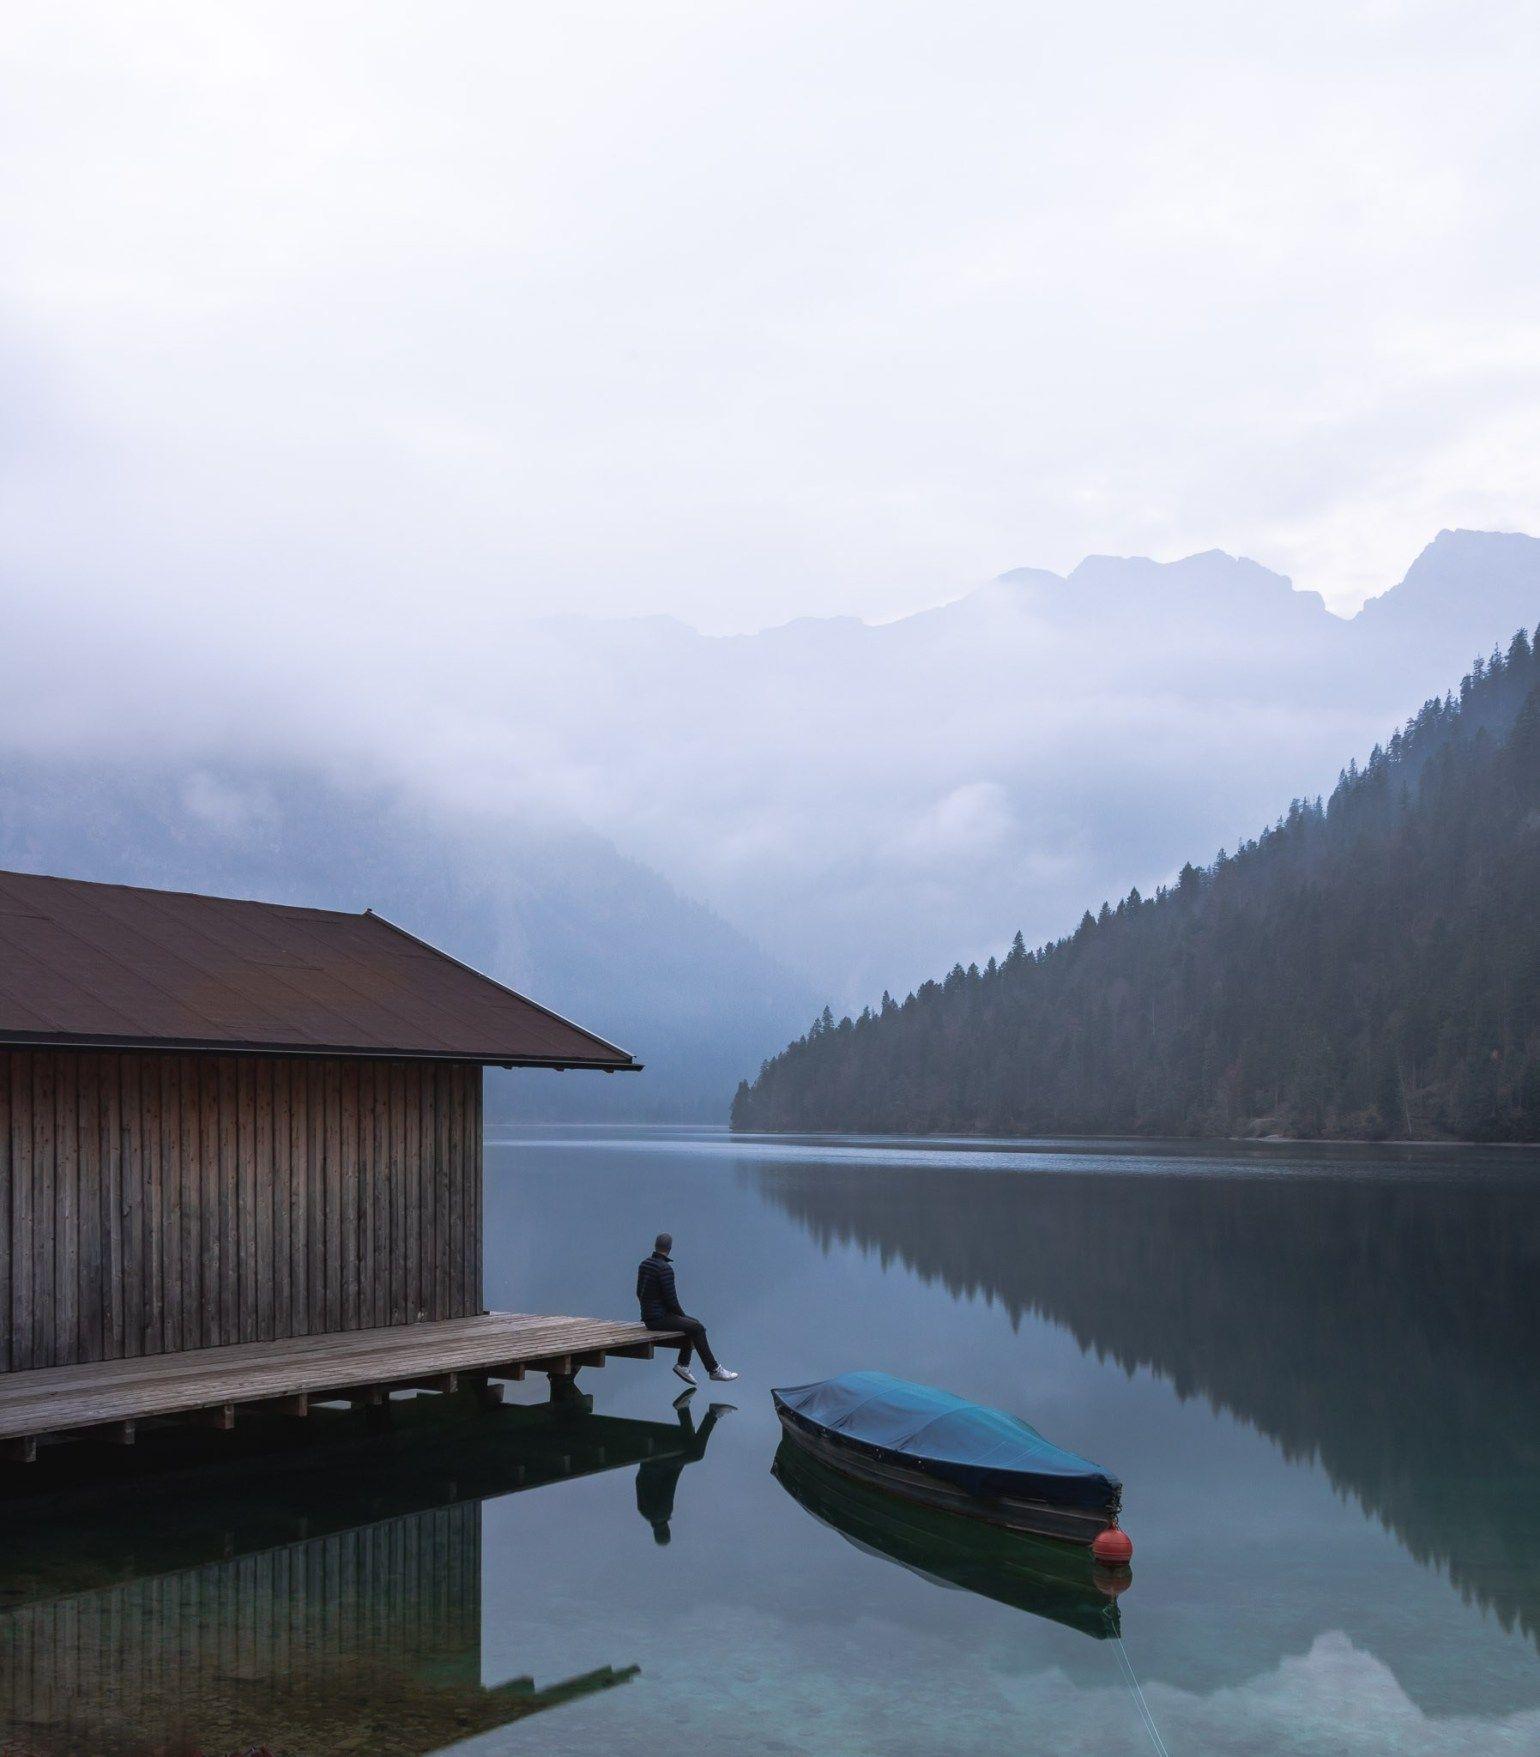 Fotografie Und Wandern Am Plansee In Tirol Binmalkuerzweg Tirol Italien Reisen Seen In Tirol